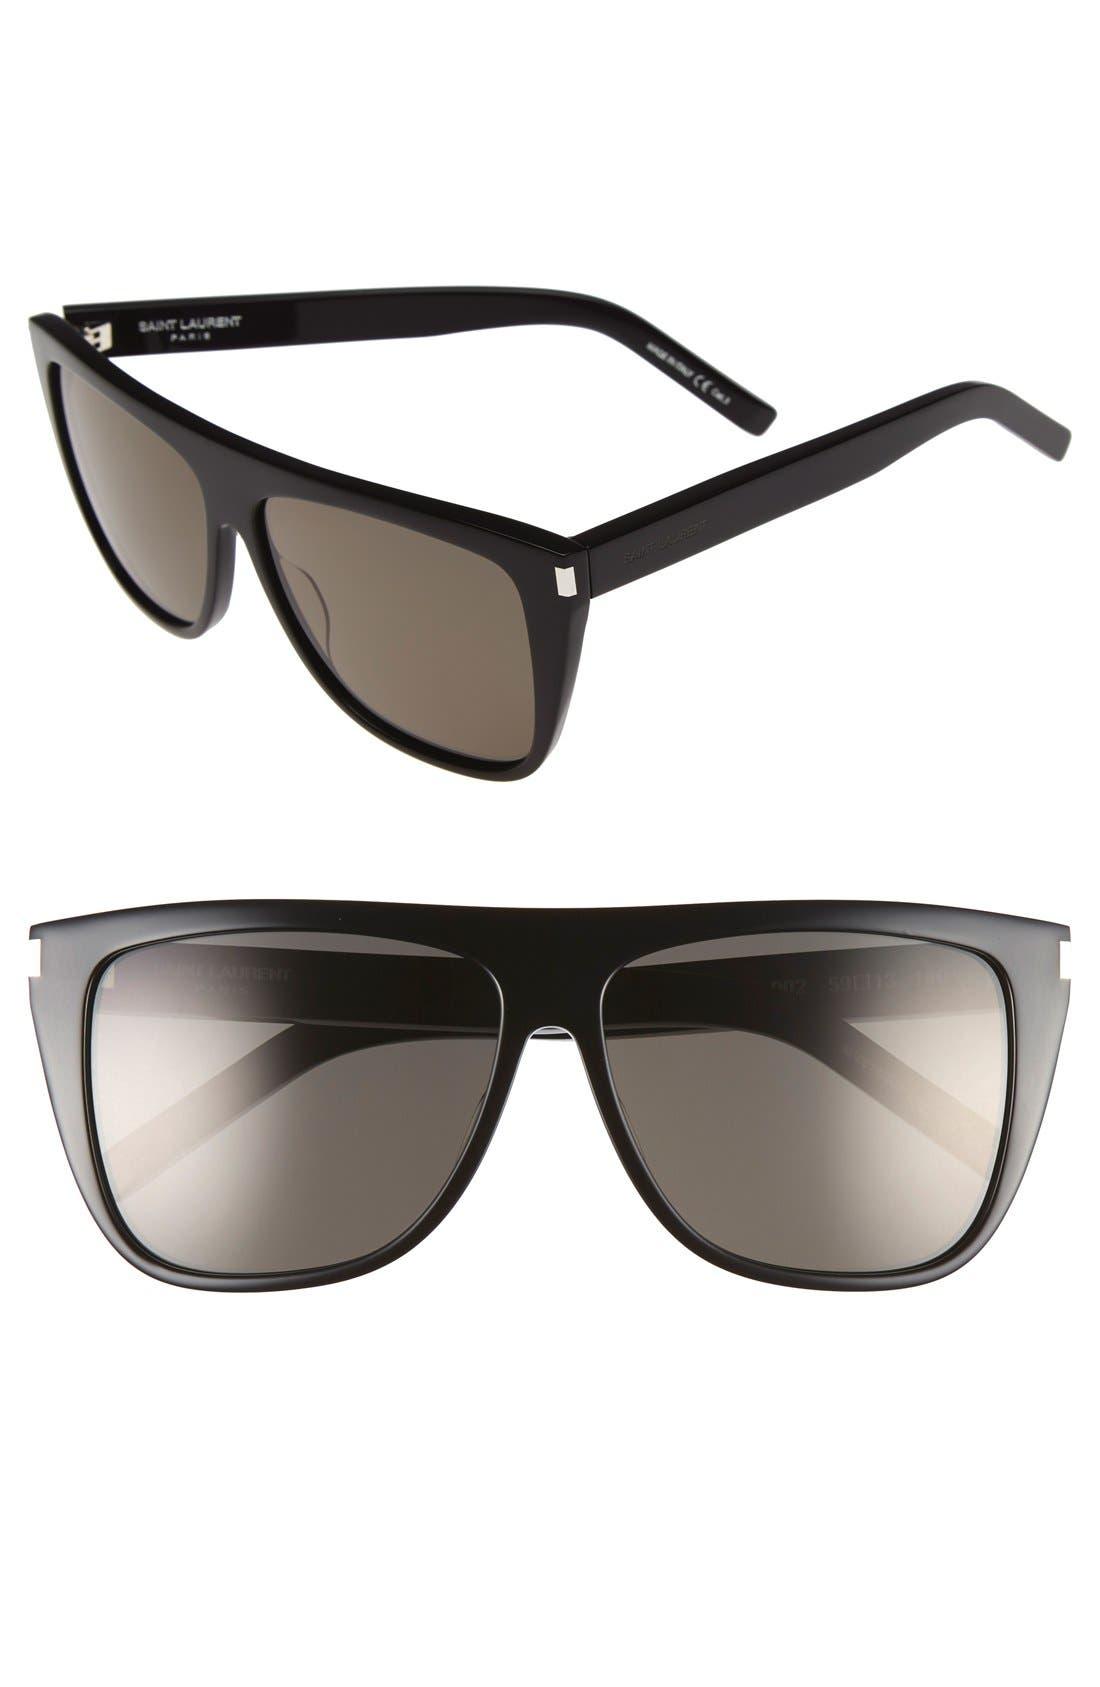 SAINT LAURENT, 59mm Sunglasses, Main thumbnail 1, color, BLACK/ SMOKE